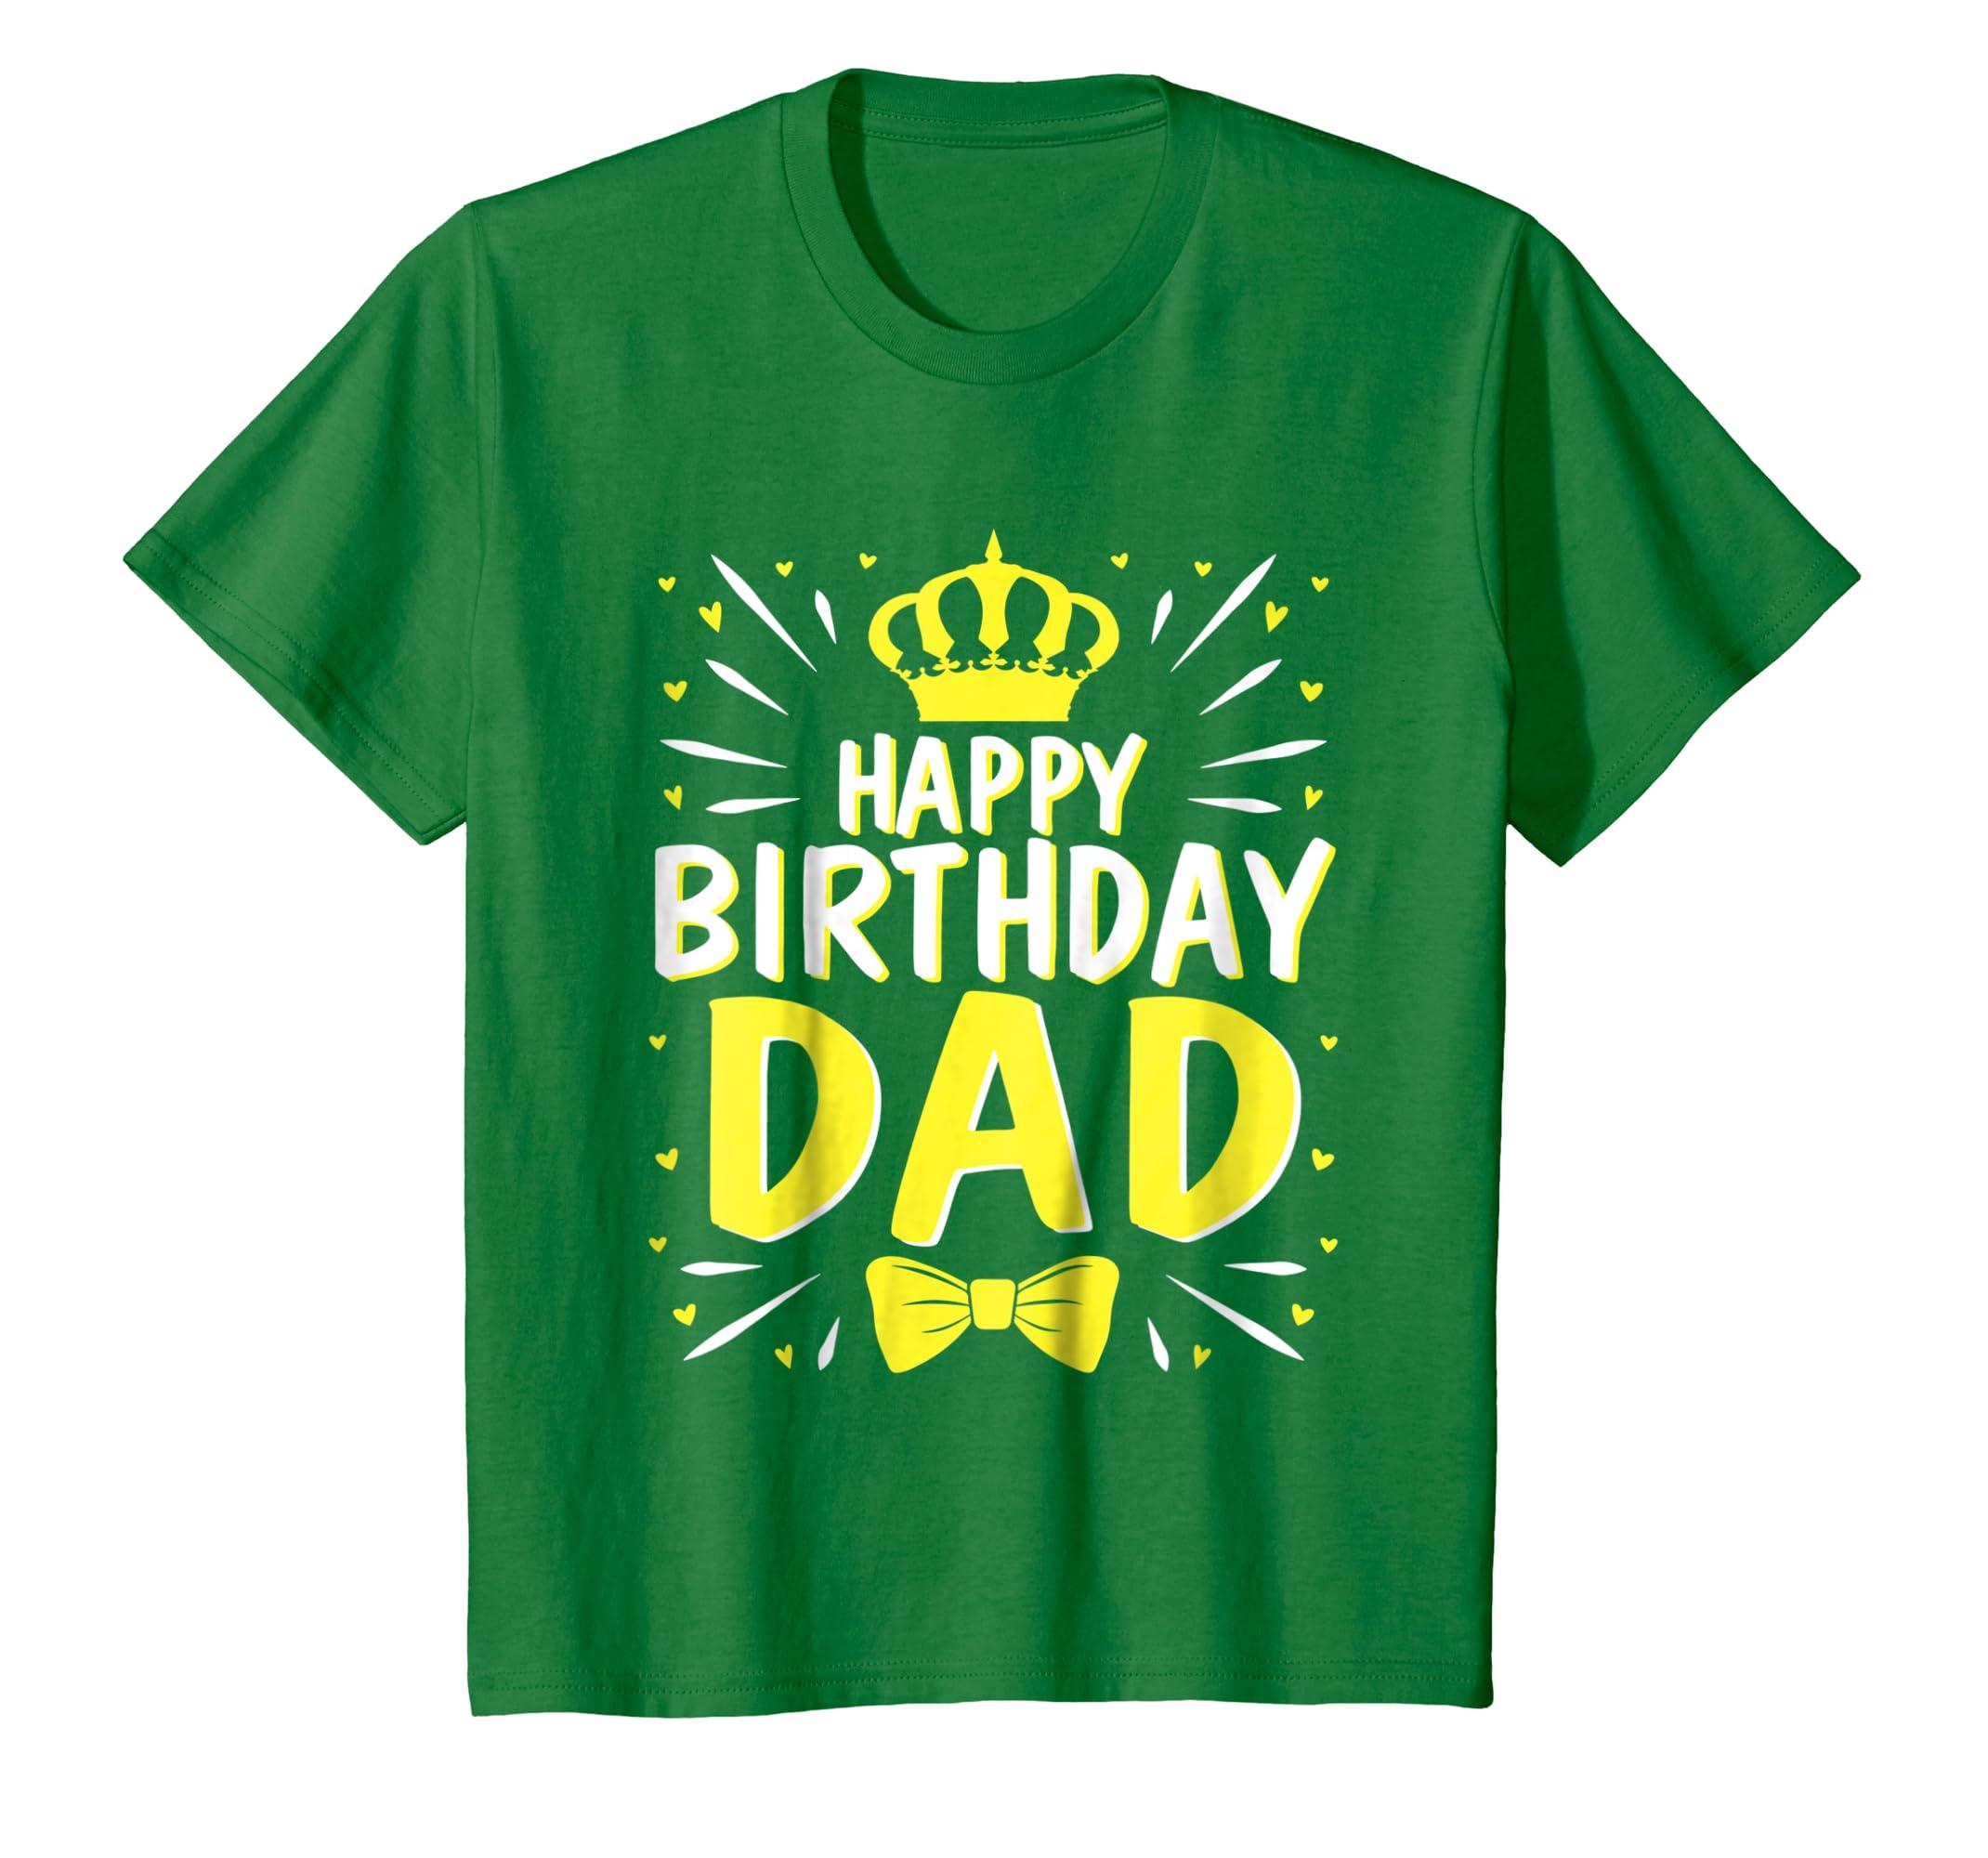 Amazon Light Star King Happy Birthday Dad Lovely Tshirt Father Clothing